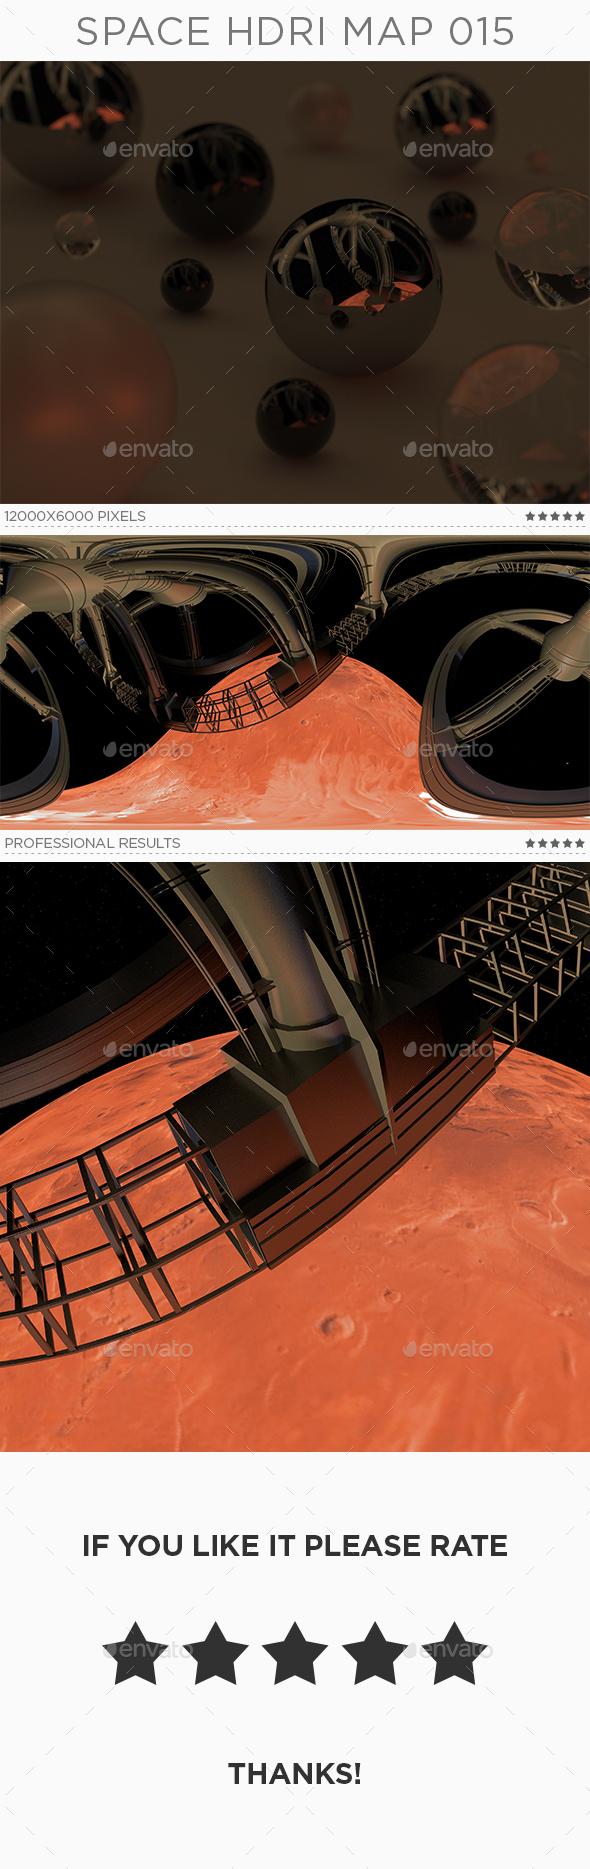 Space HDRi Map 015 - 3DOcean Item for Sale